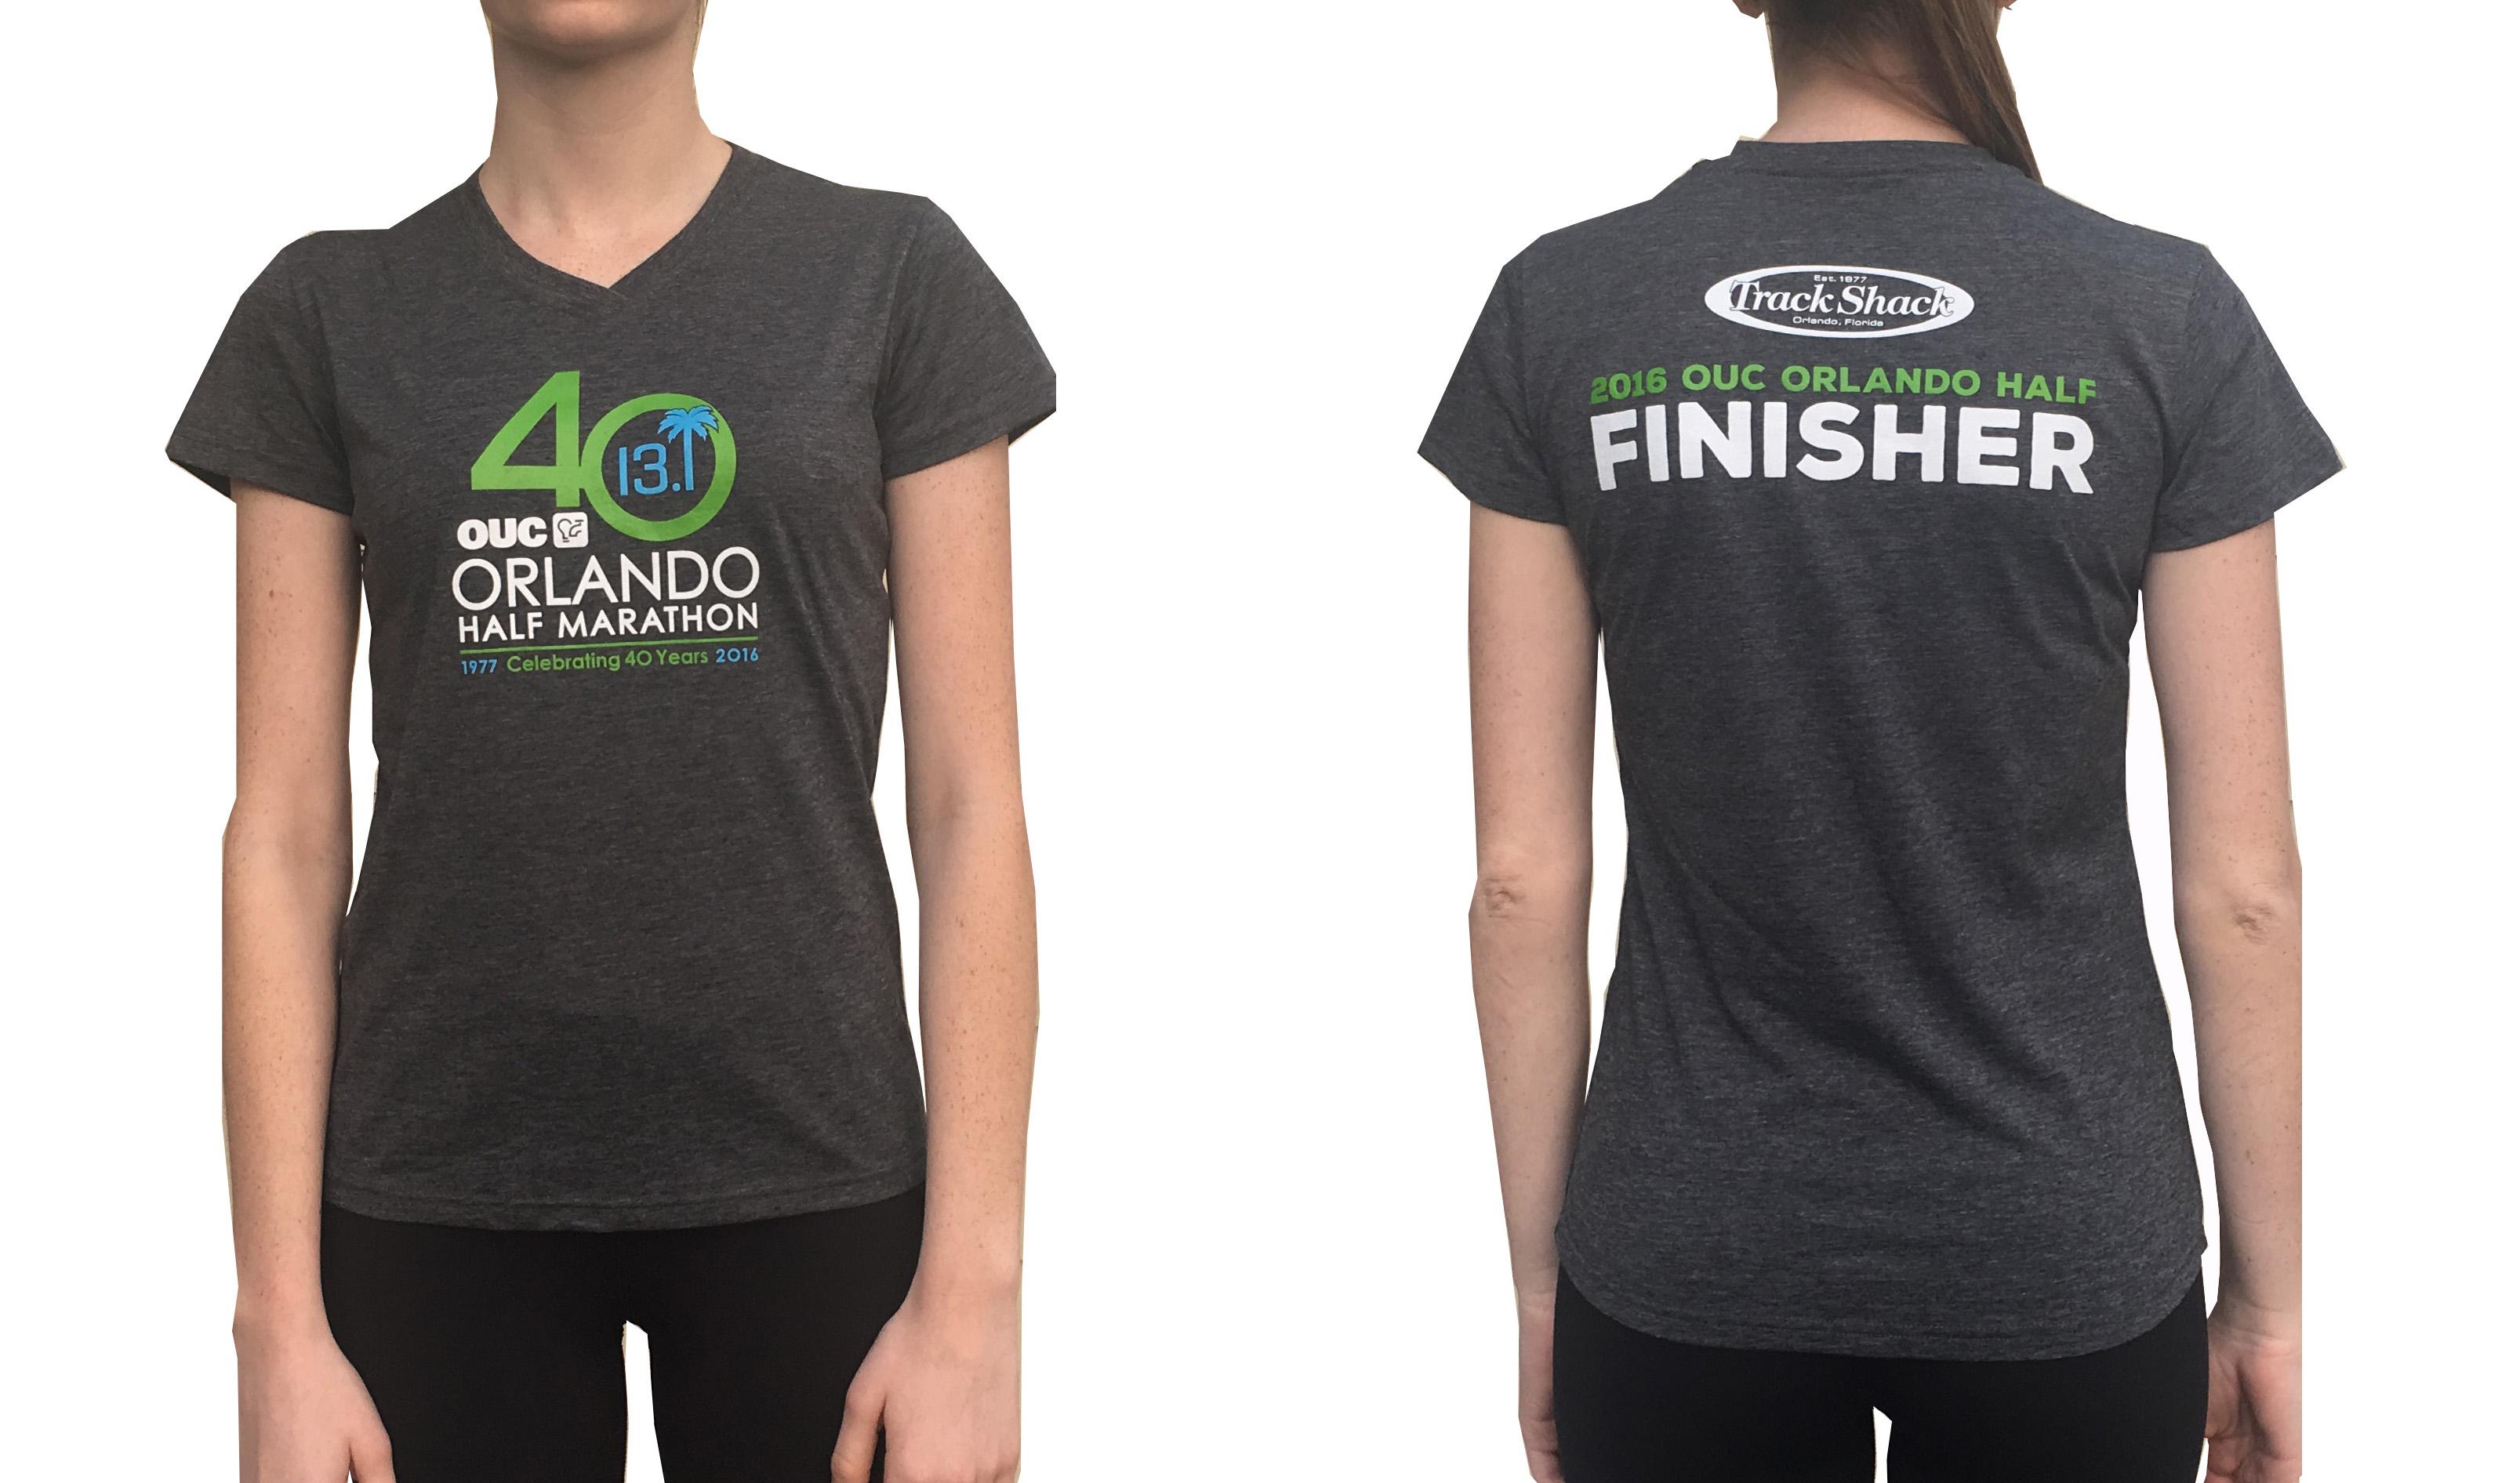 OUC Orlando Half Finisher Shirt